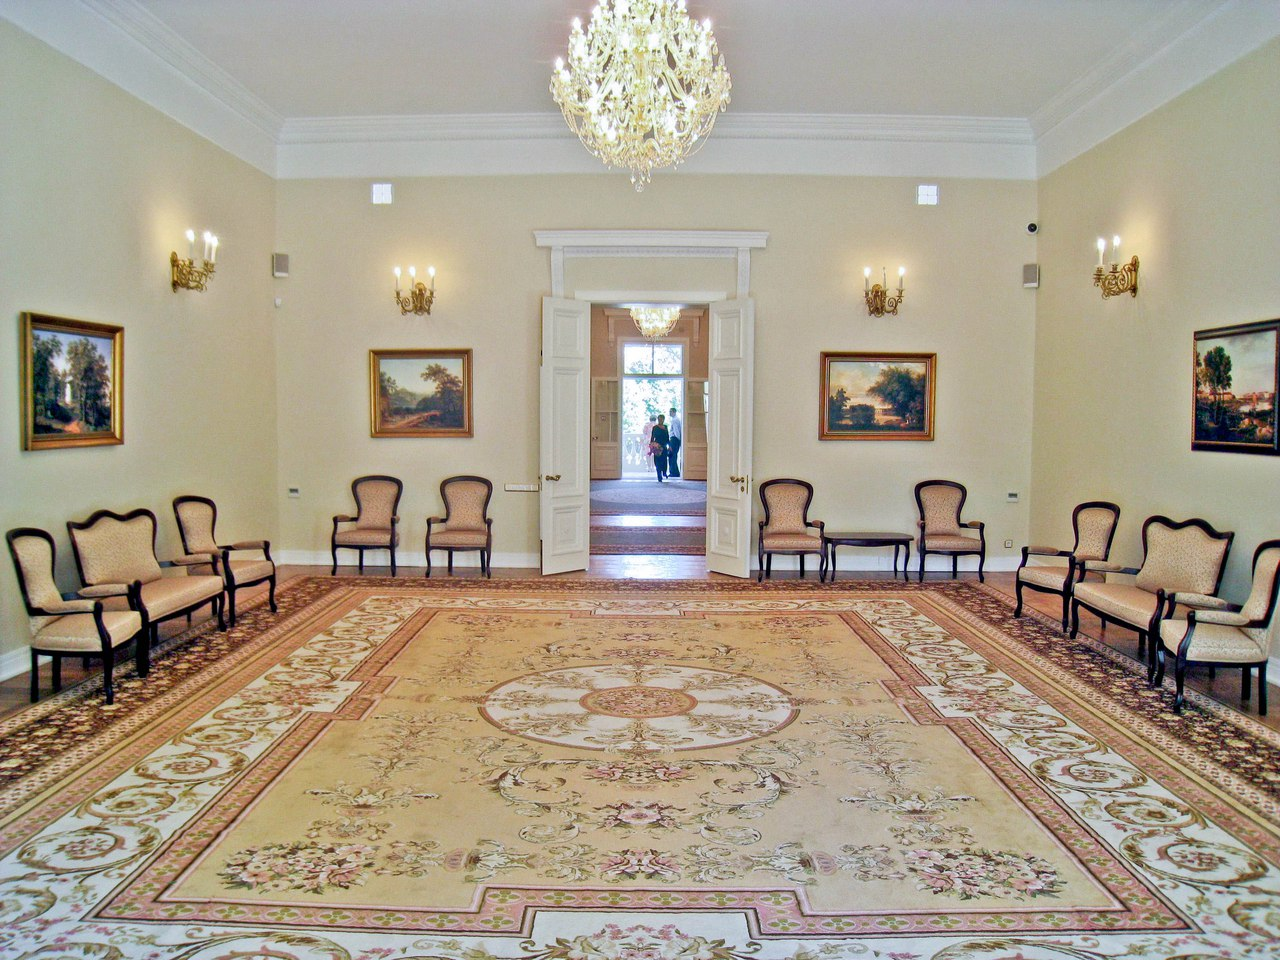 Дворец Бракосочетания № 3. Фото: kzags.gov.spb.ru/palaces/25